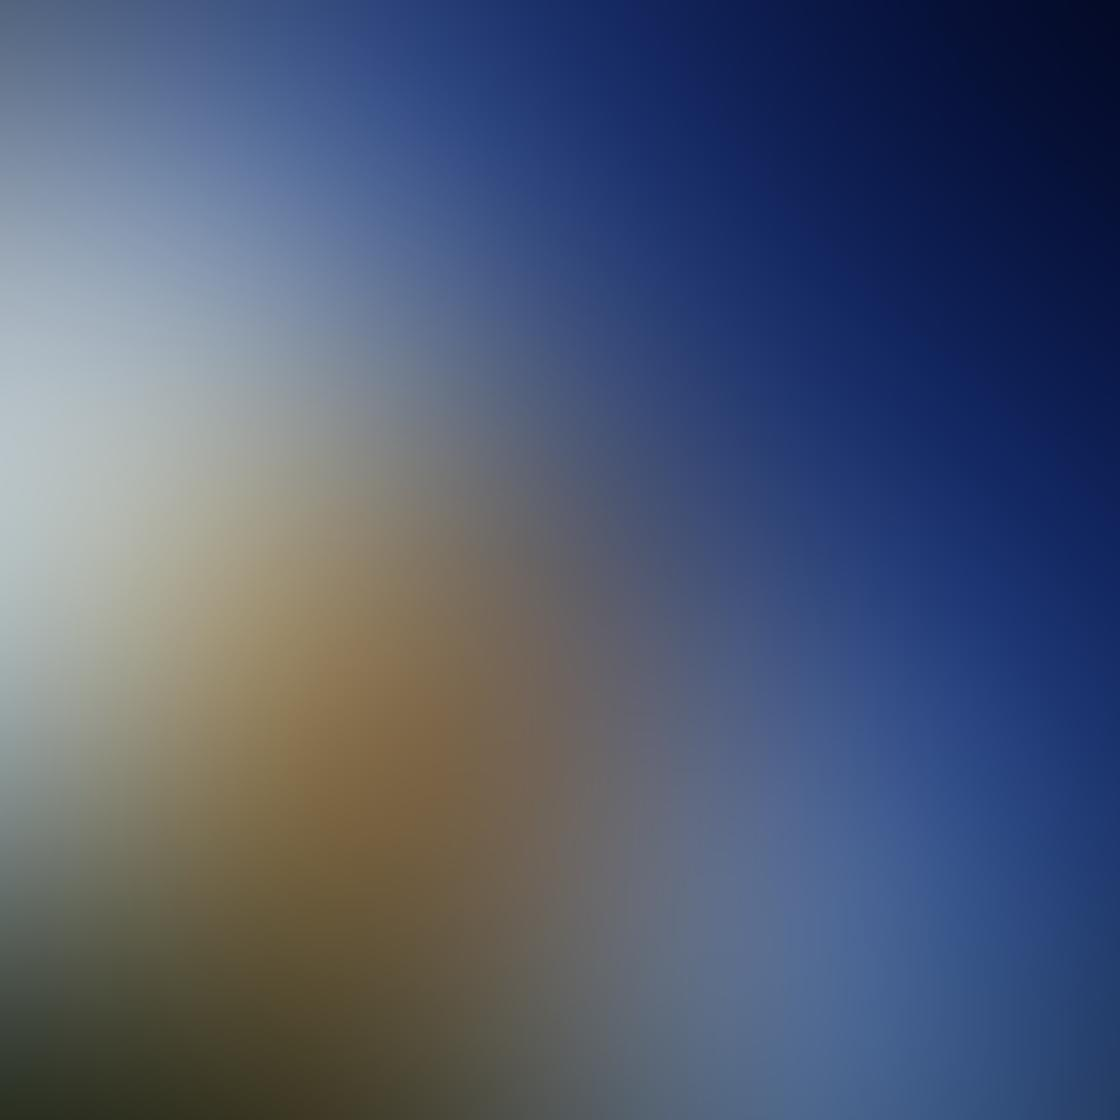 iPhone Photo Exposure 11